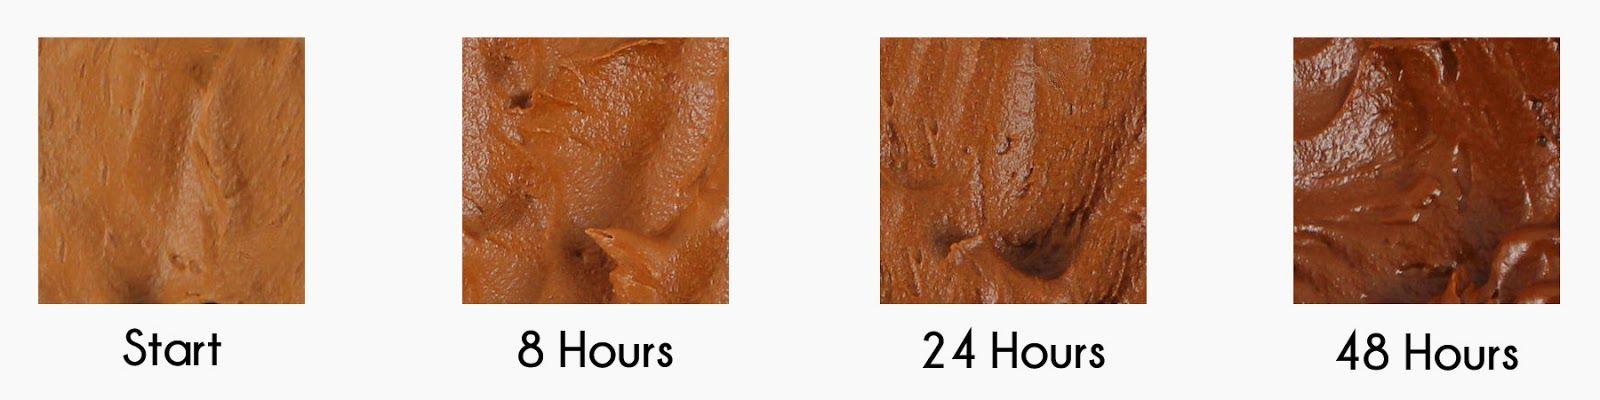 How to Make Dark Brown Royal Icing | Royal Icing Color | Pinterest ...